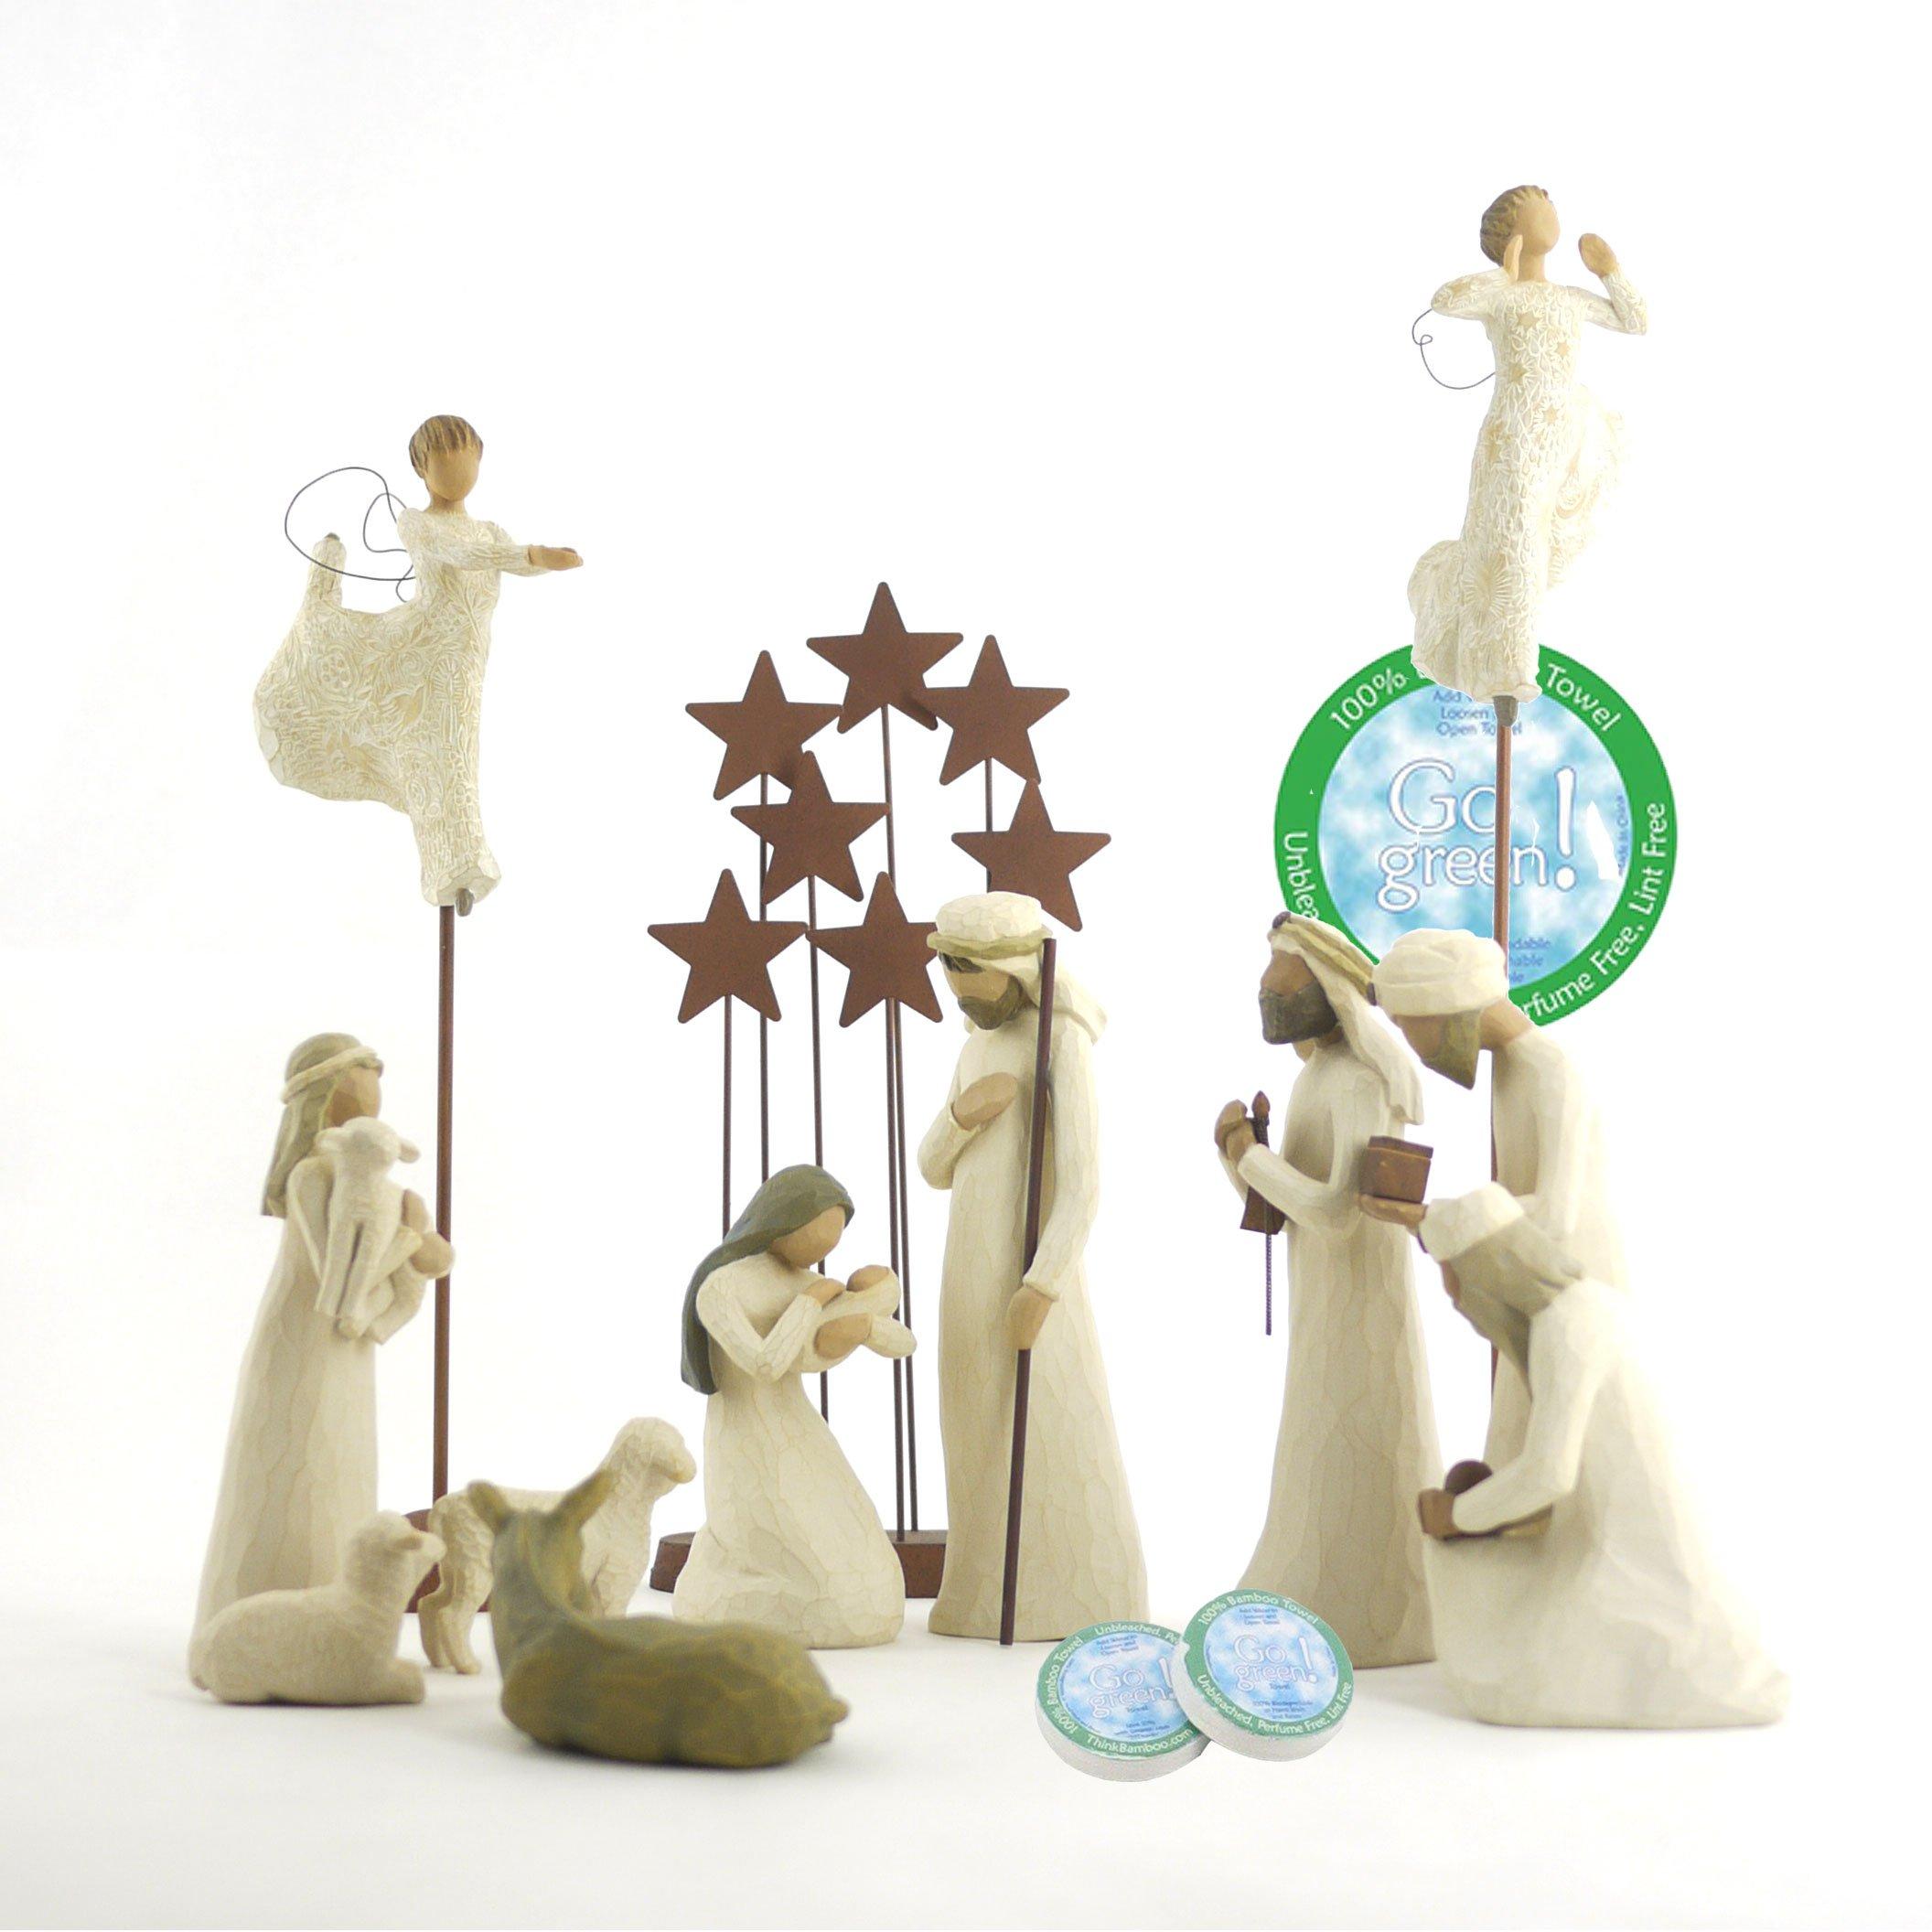 Willow Tree 12 Piece Nativity Set